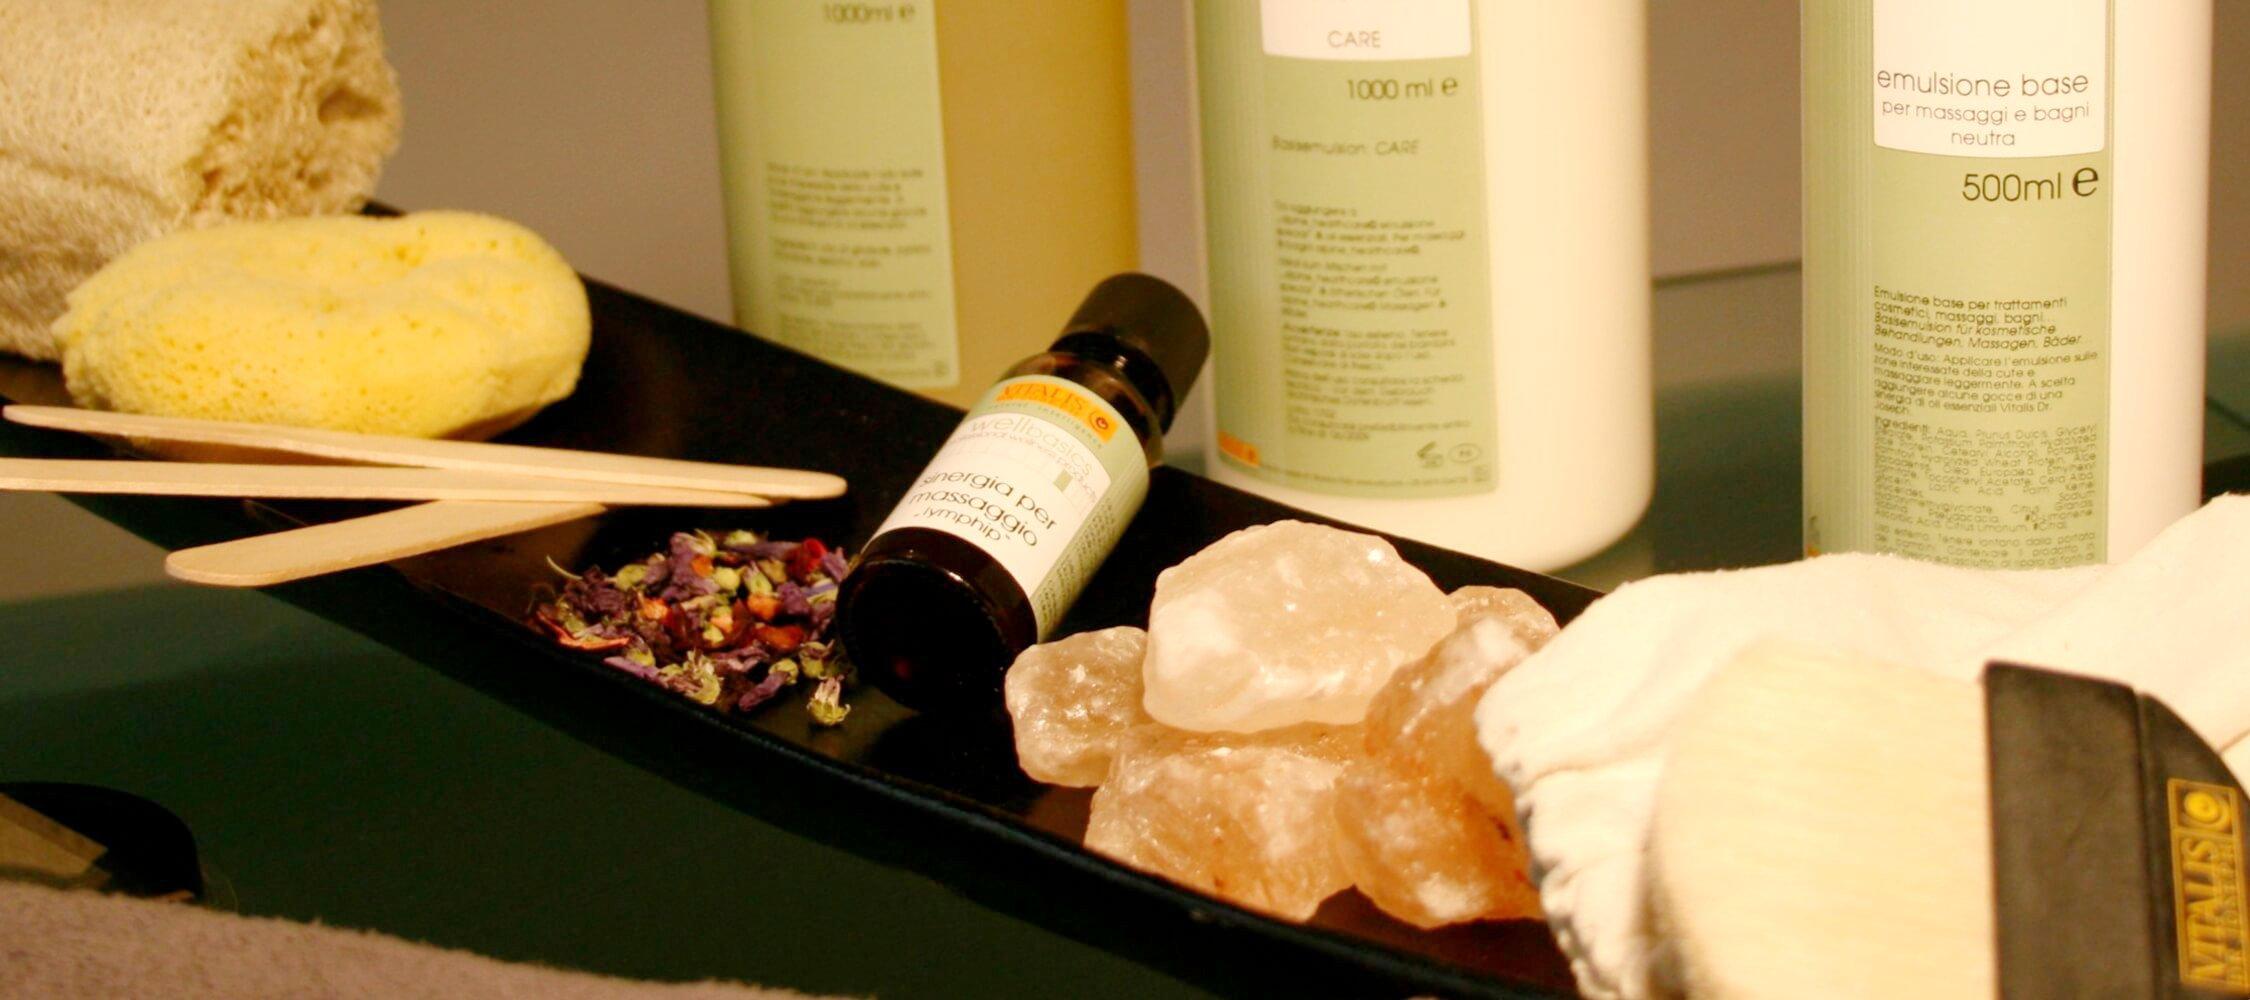 City Hotel Meran, SPA, Massageprodukte von Vitalis Dr. Joseph, Südtiroler Markenprodukt